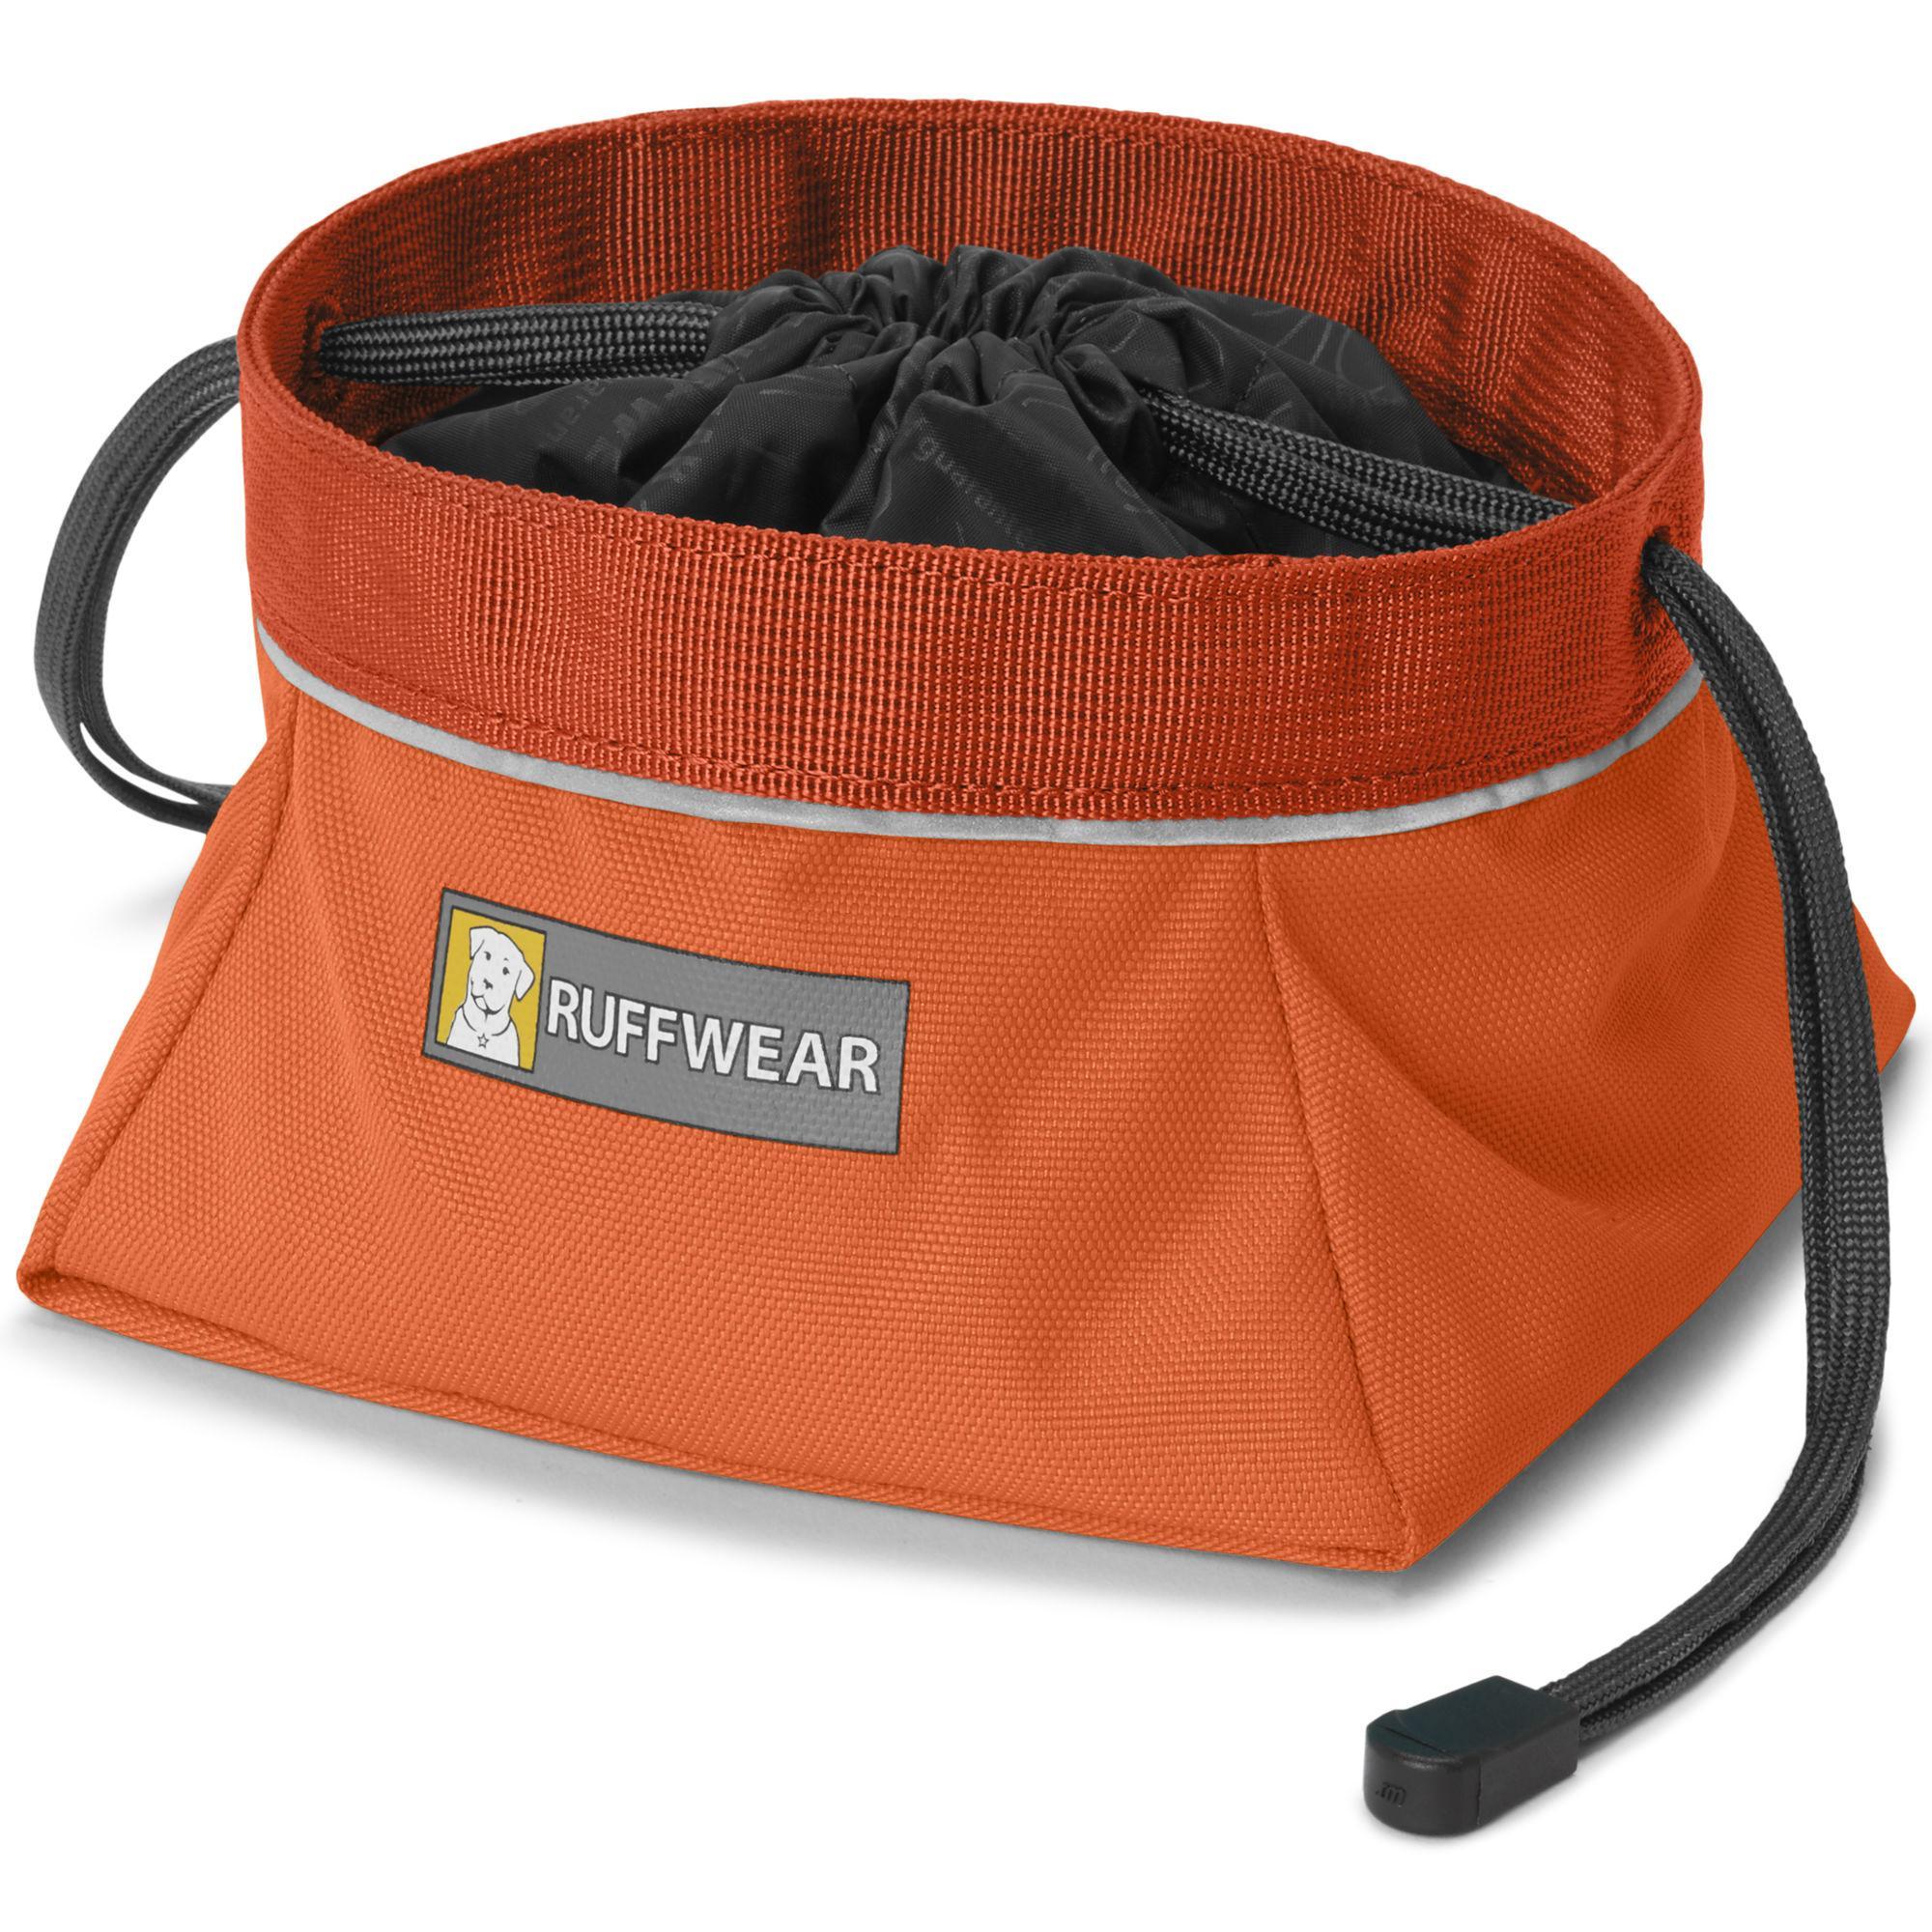 Quencher Cinch Top Dog Bowl by RuffWear - Pumpkin Orange